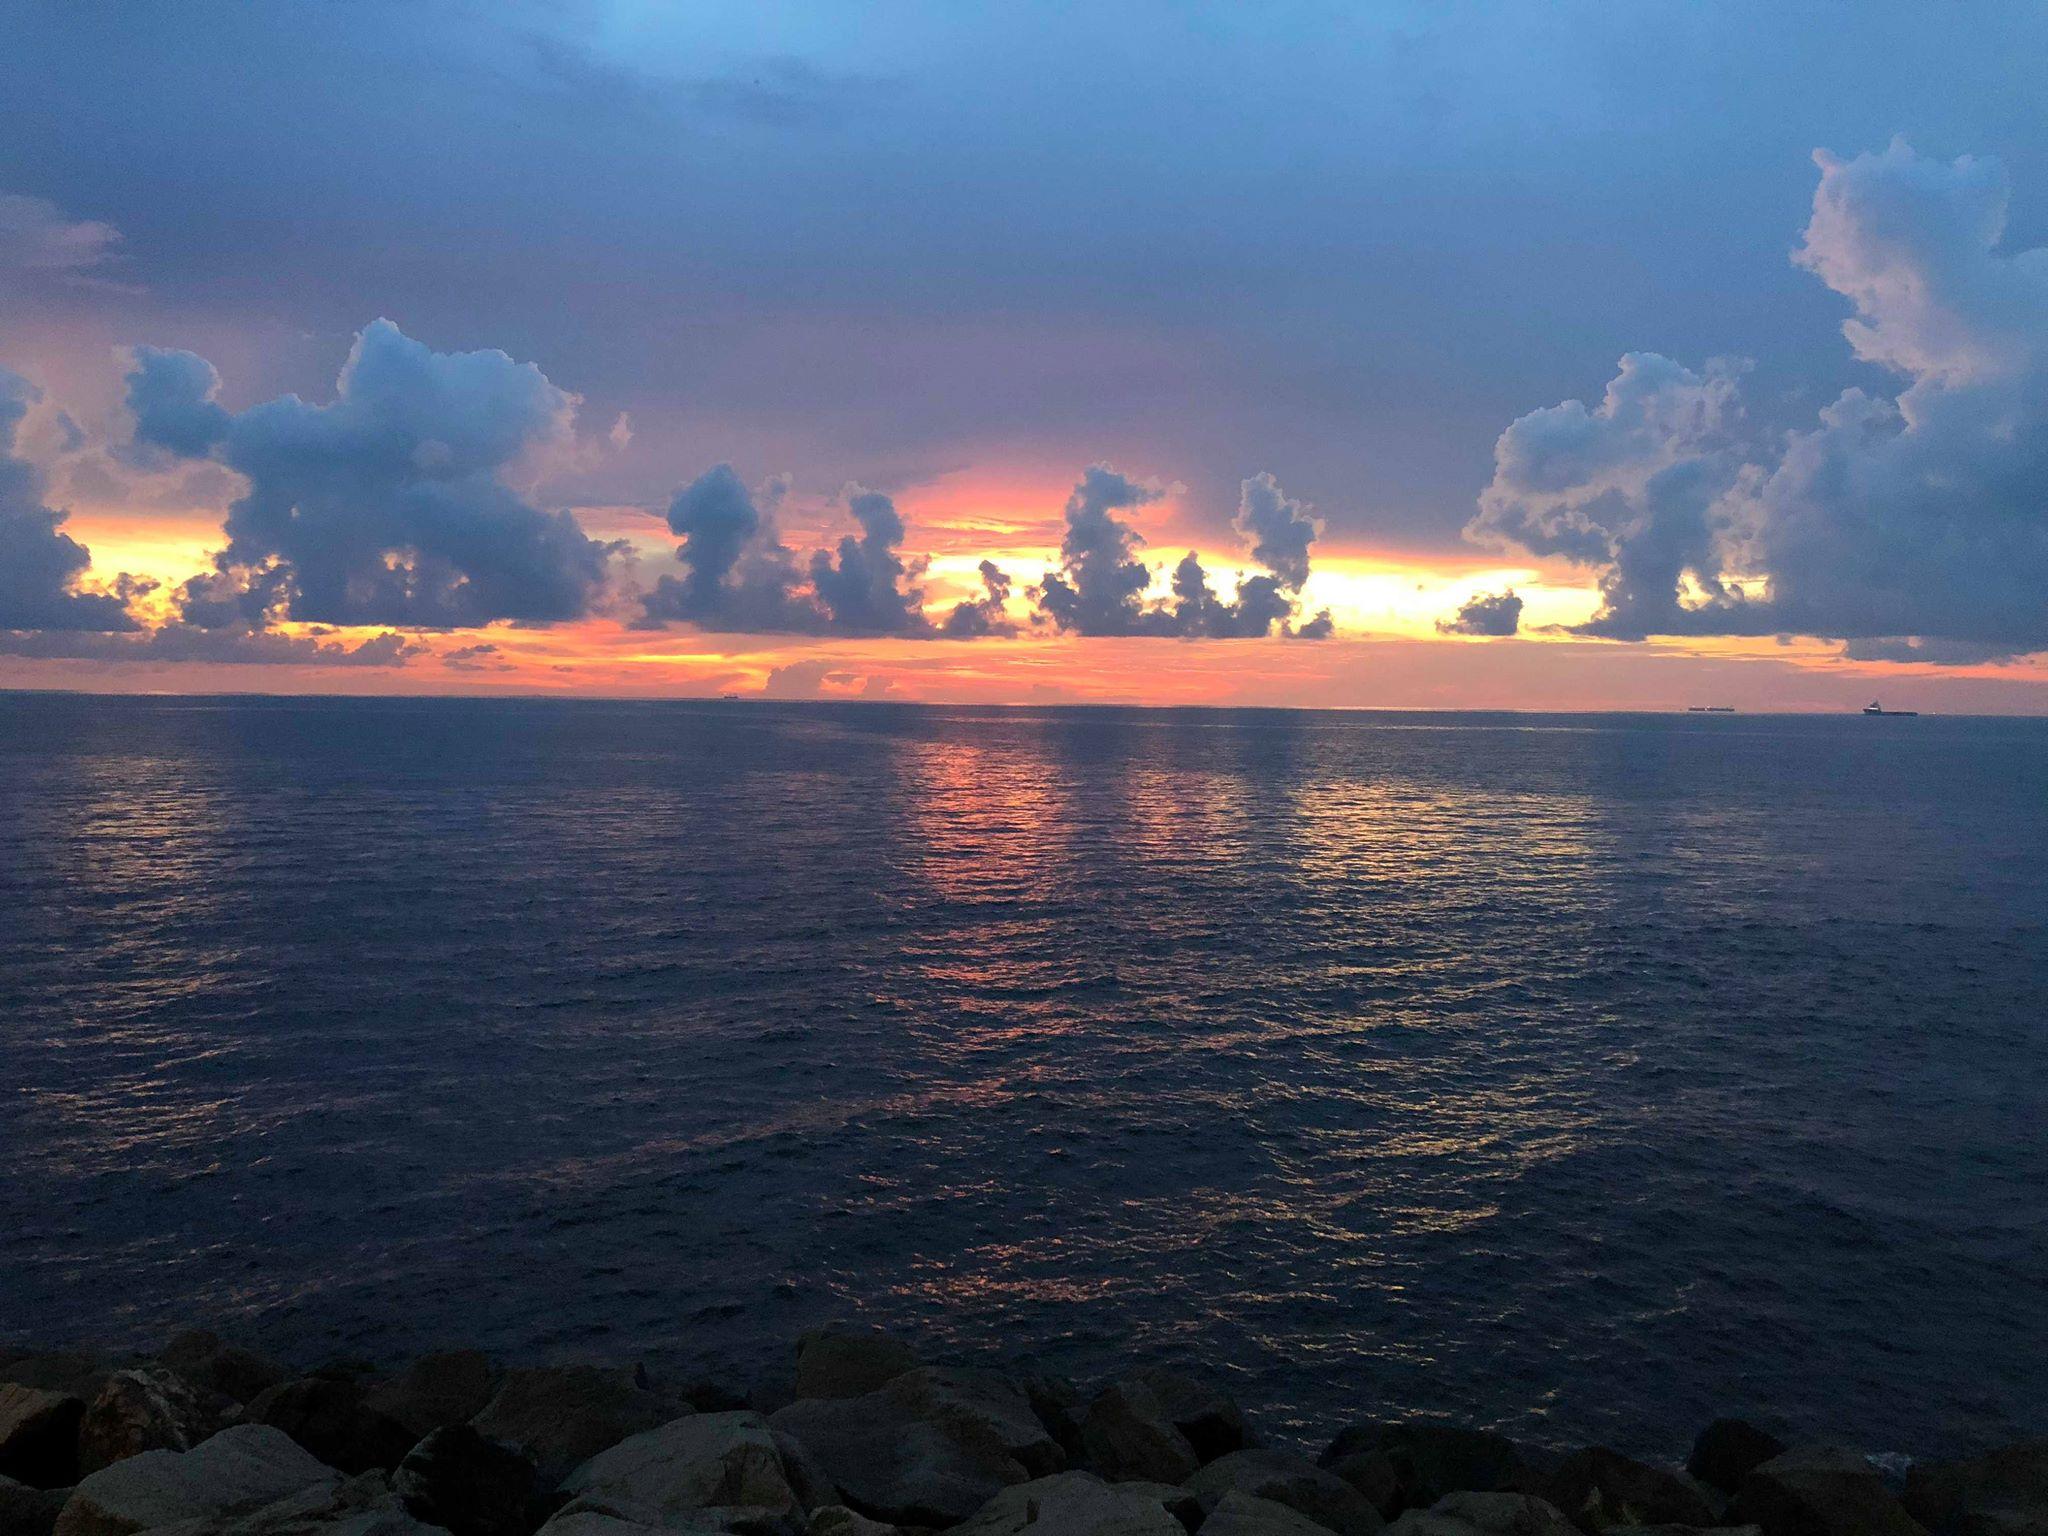 Sarawak Borneo sunset